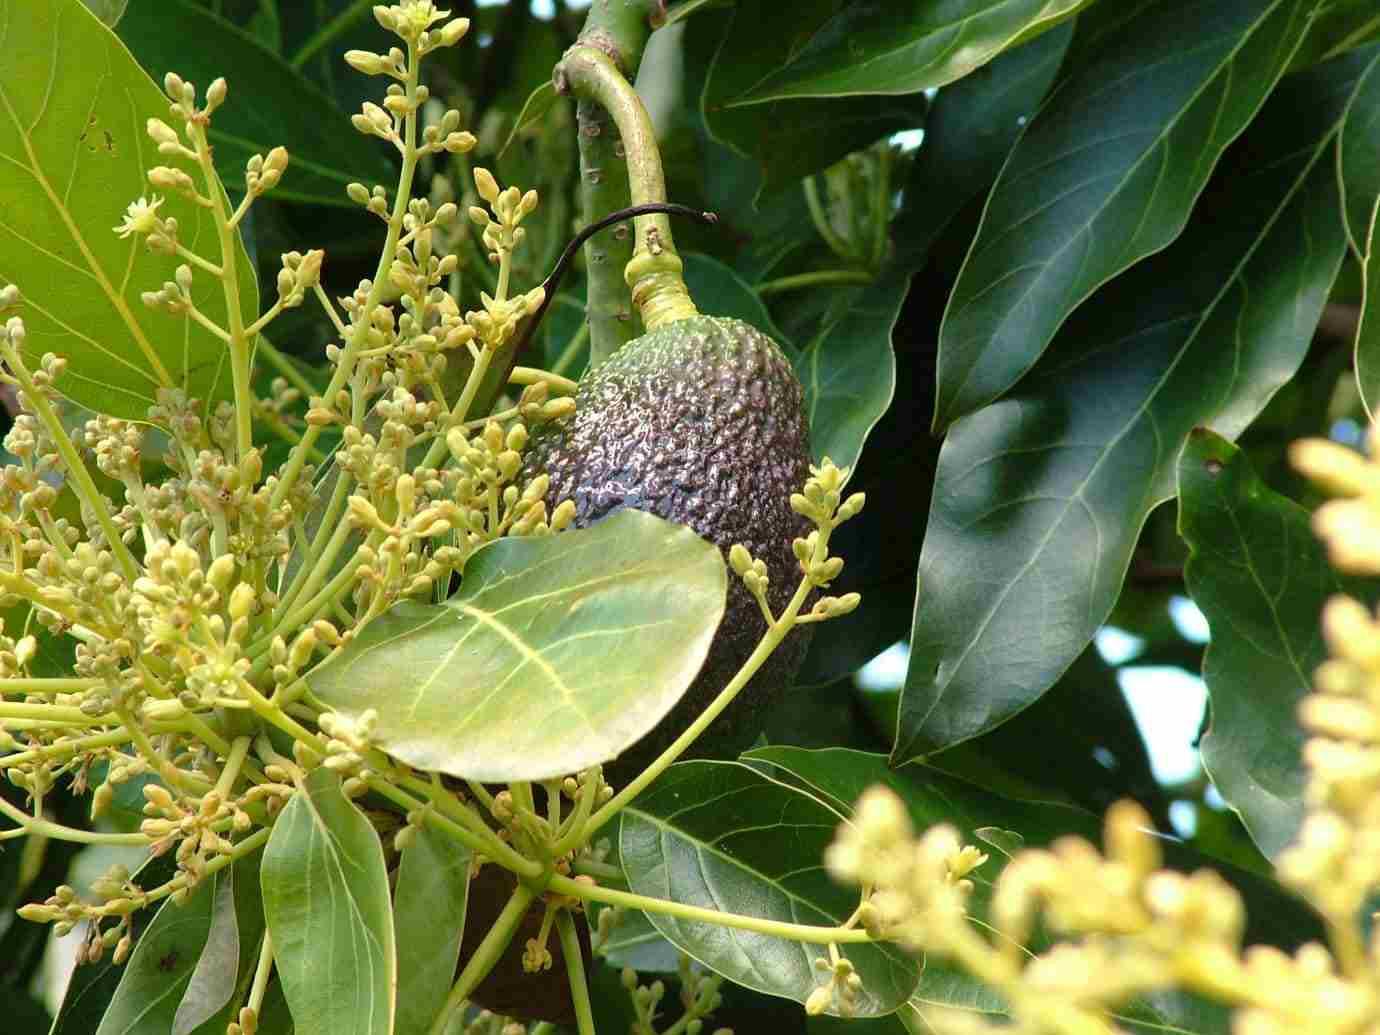 Fruct de avocado cu flori